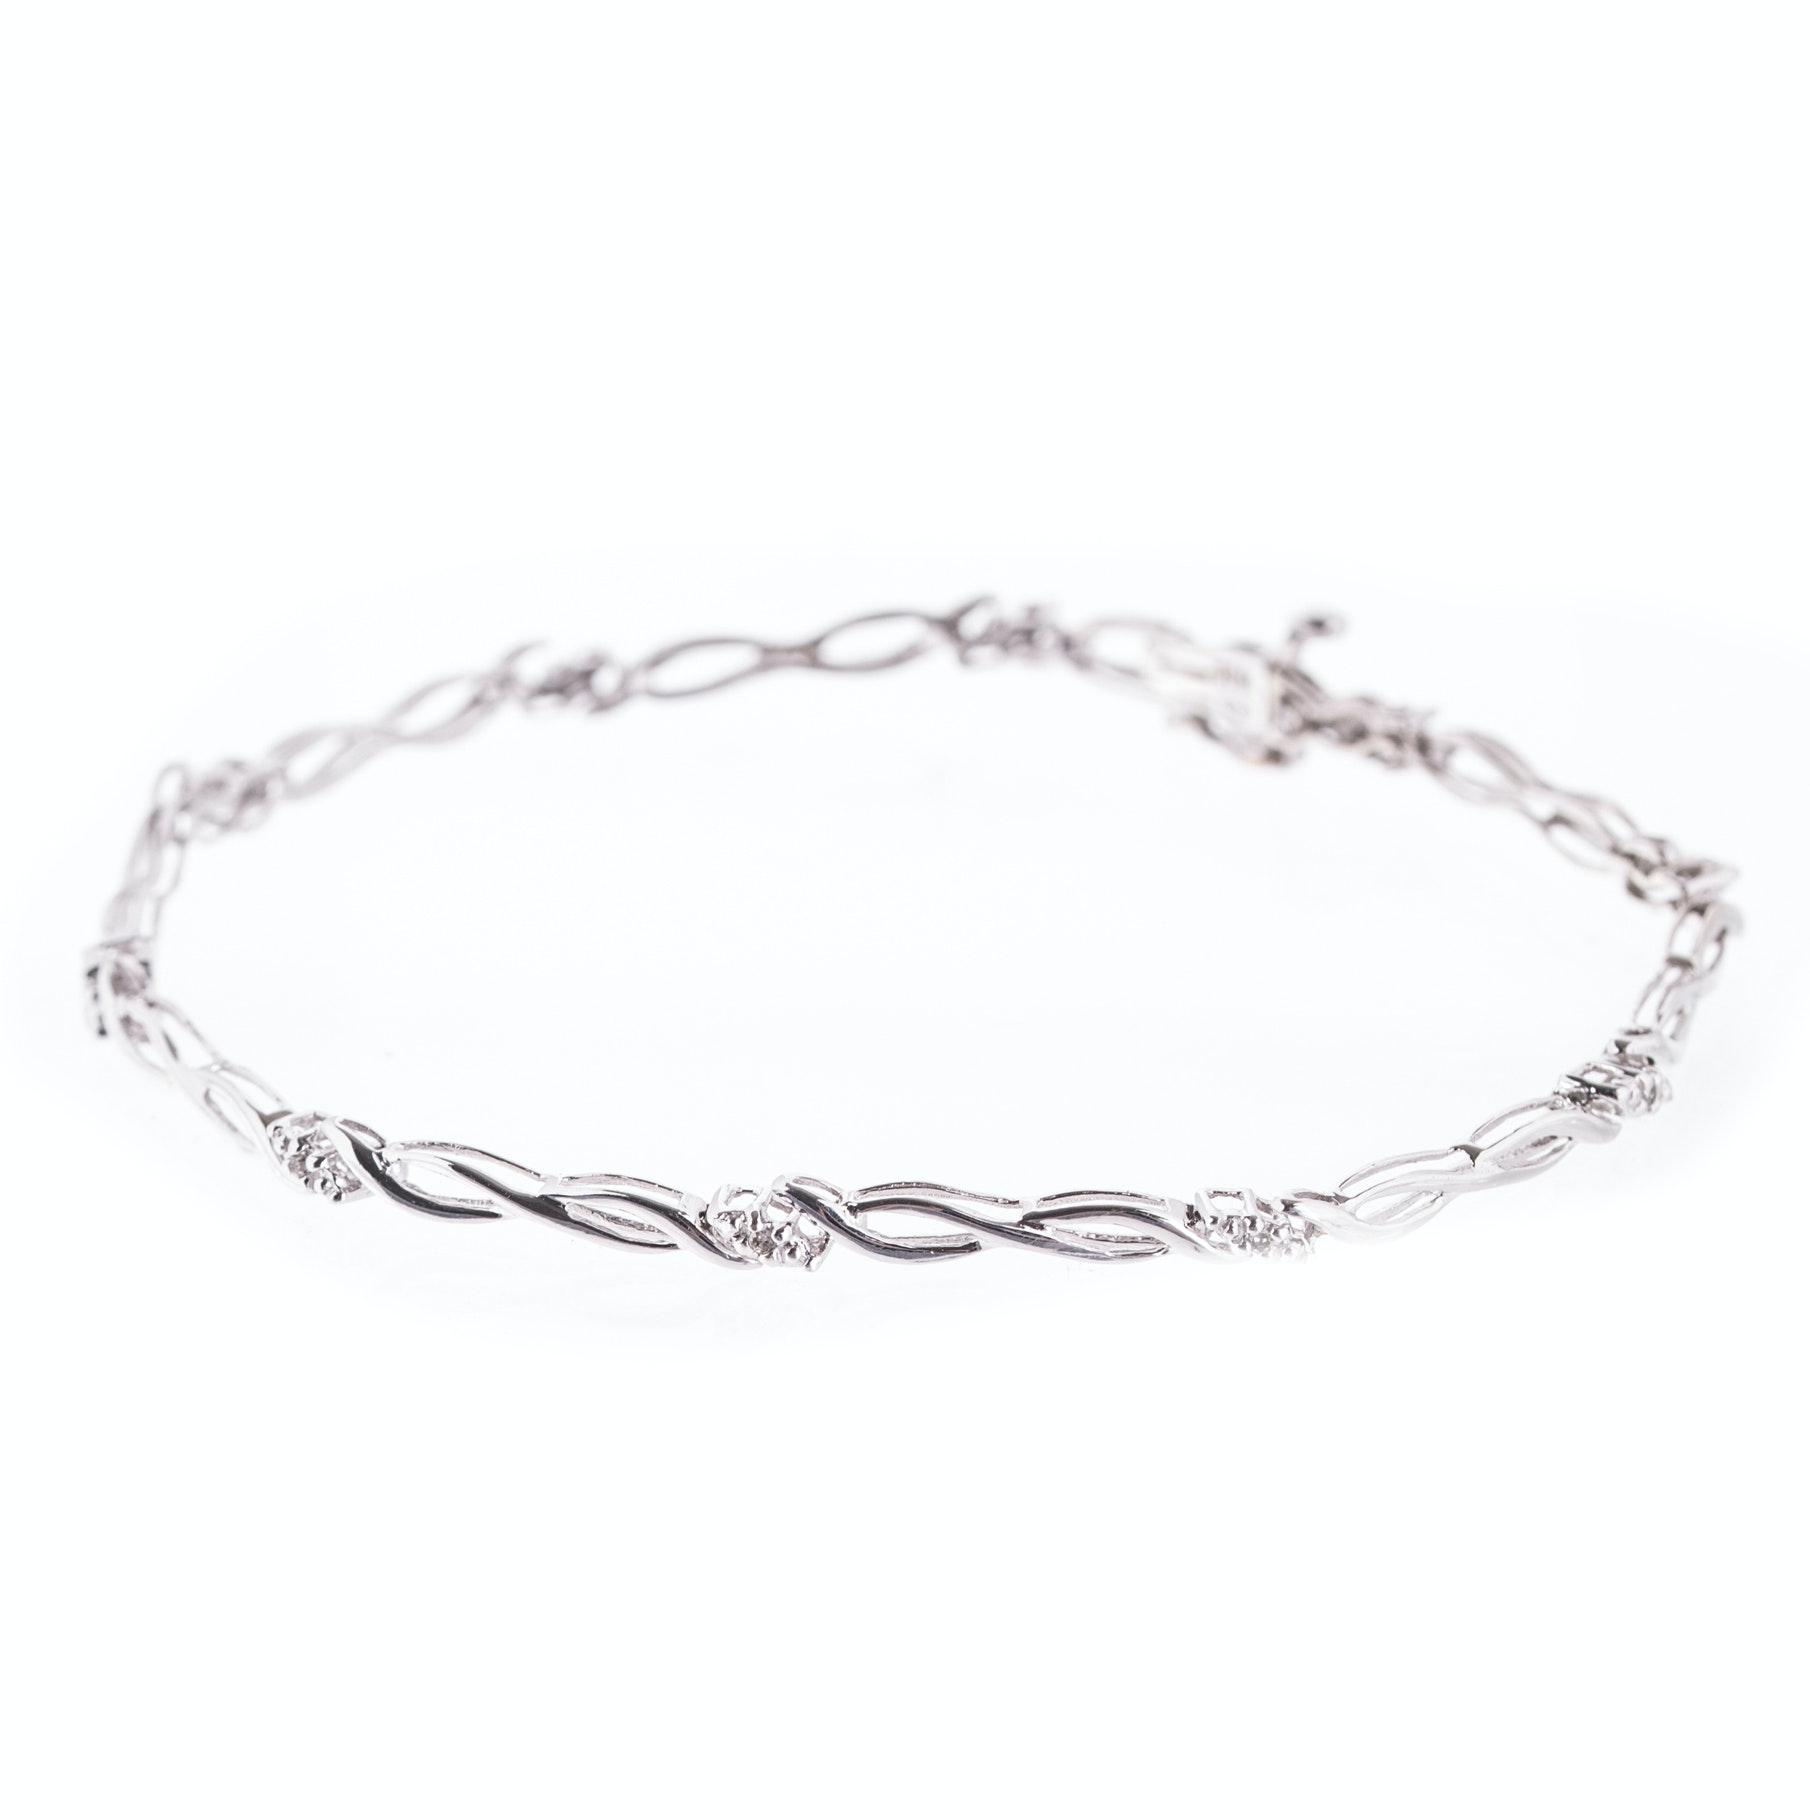 10K White Gold and Diamond Fancy Link Tennis Bracelet